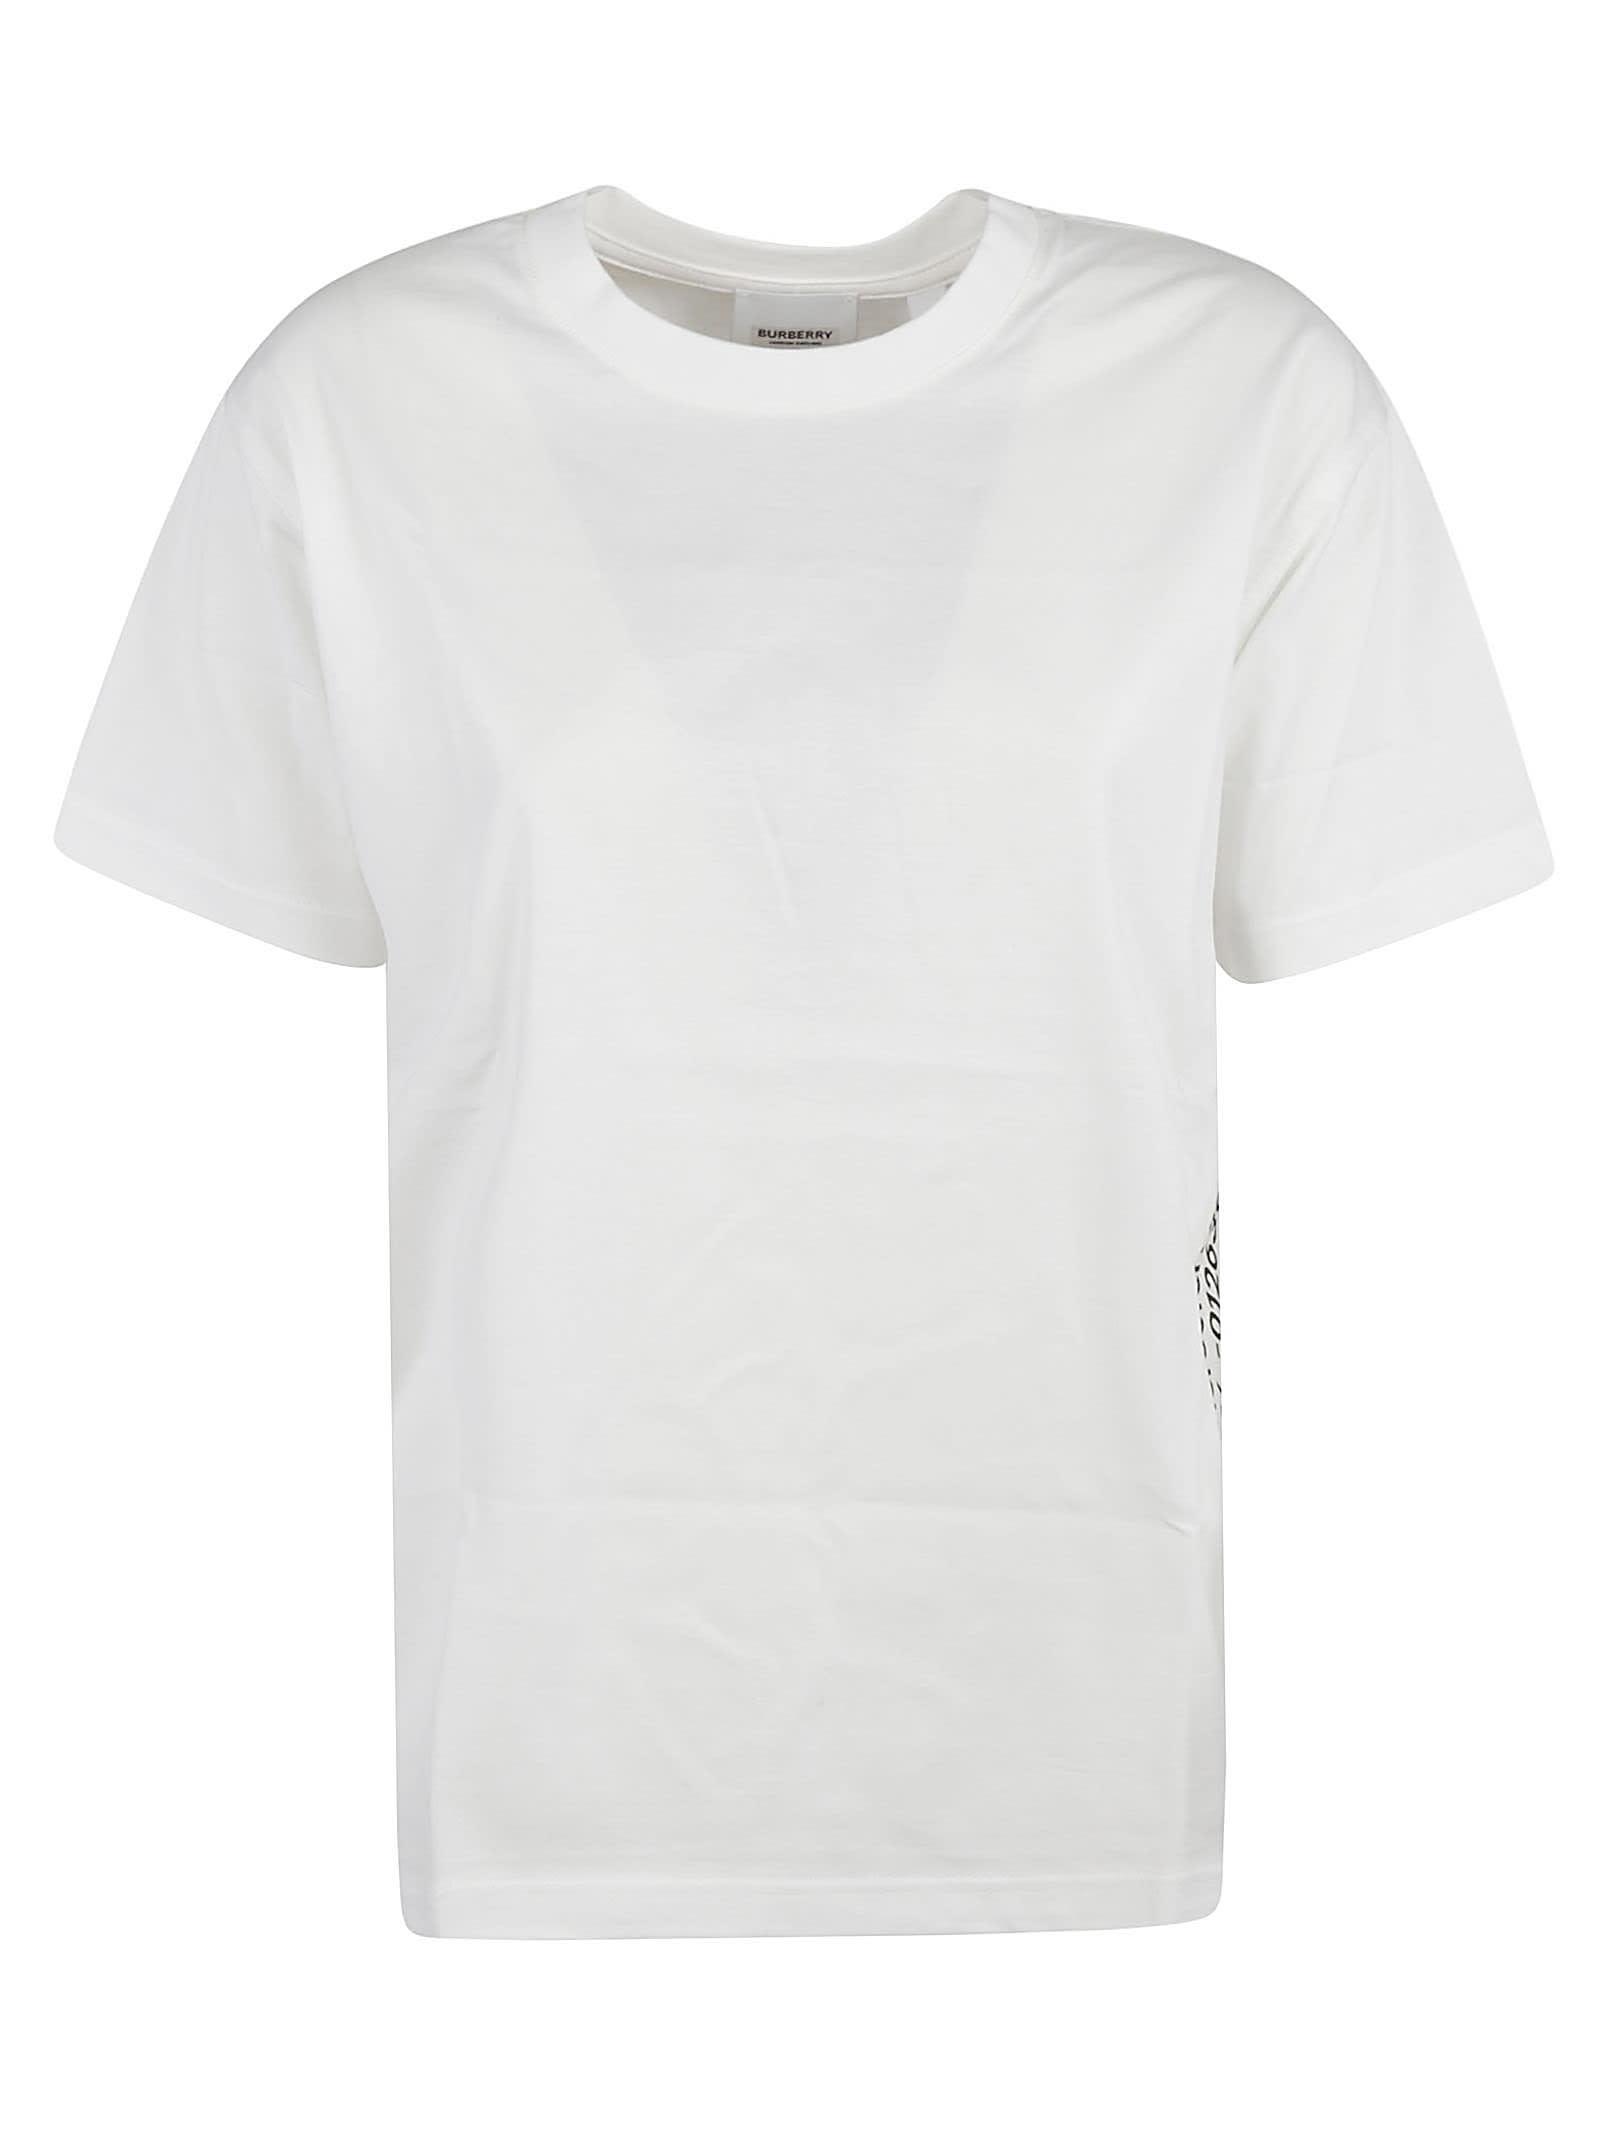 Burberry Back Logo Print T-shirt In White